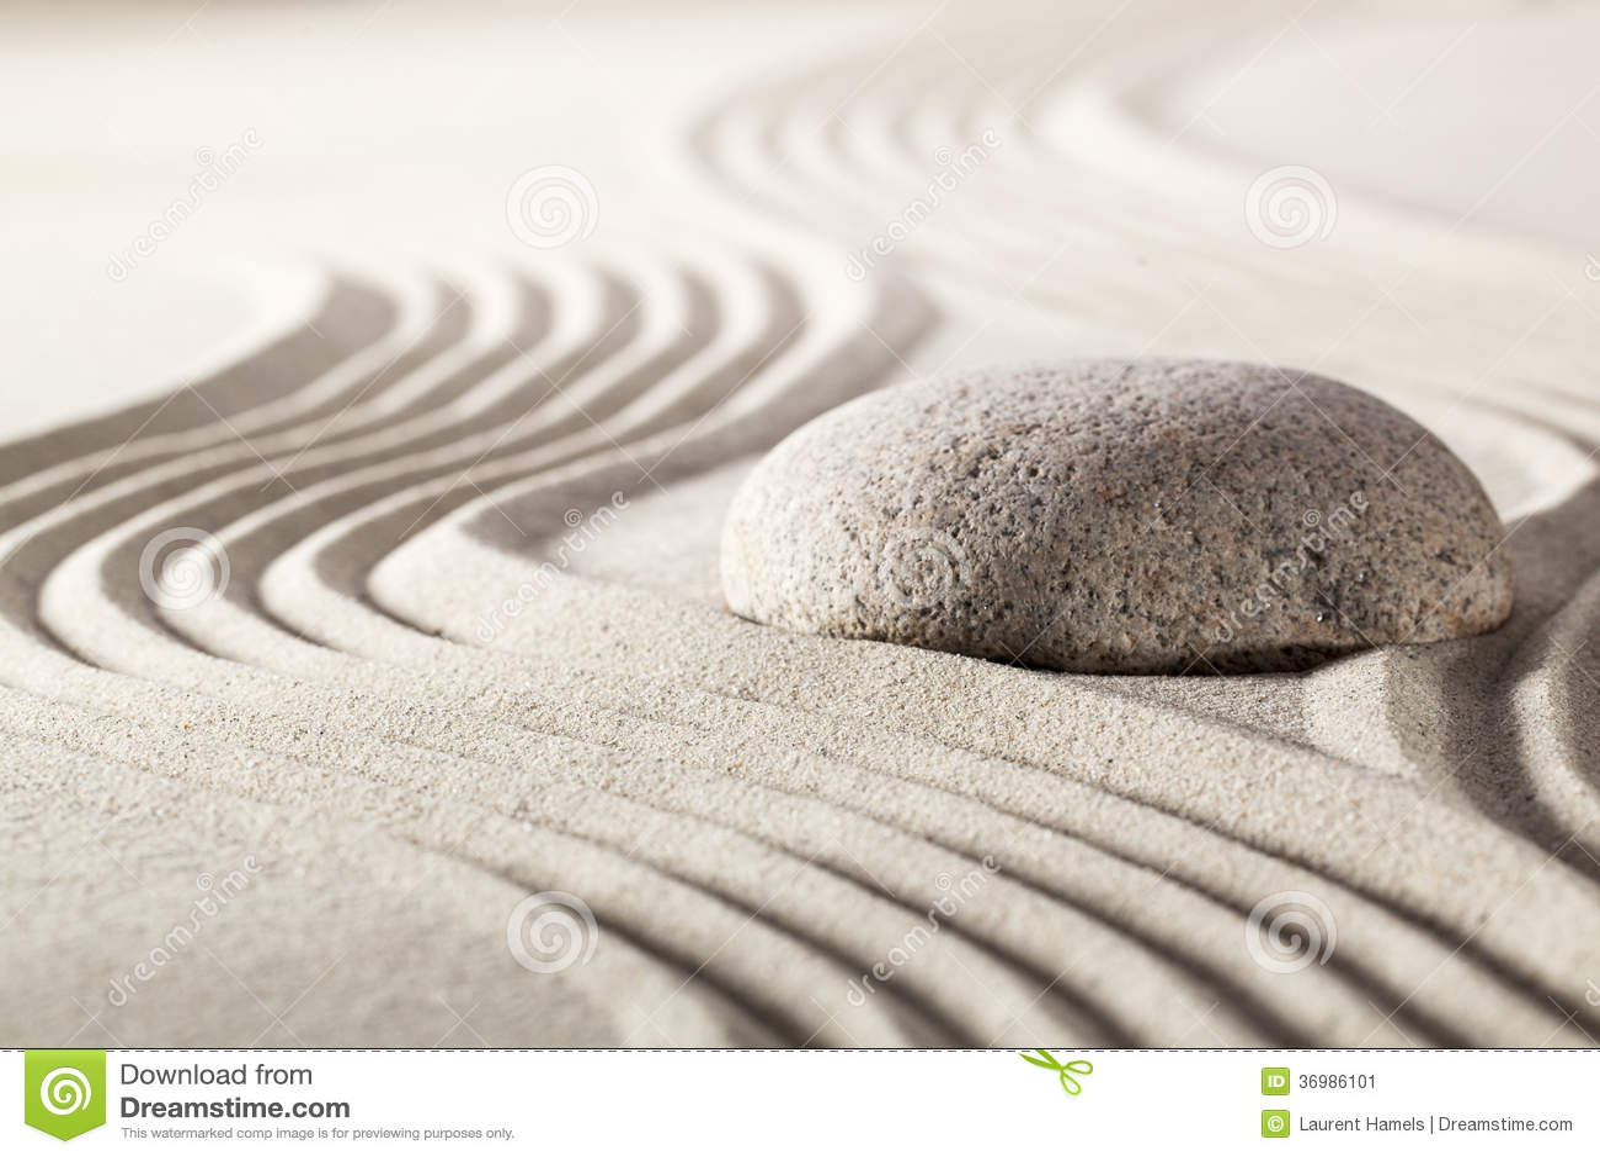 Zen attitude facing challenge stock image image 36986101 - Symbole zen attitude ...